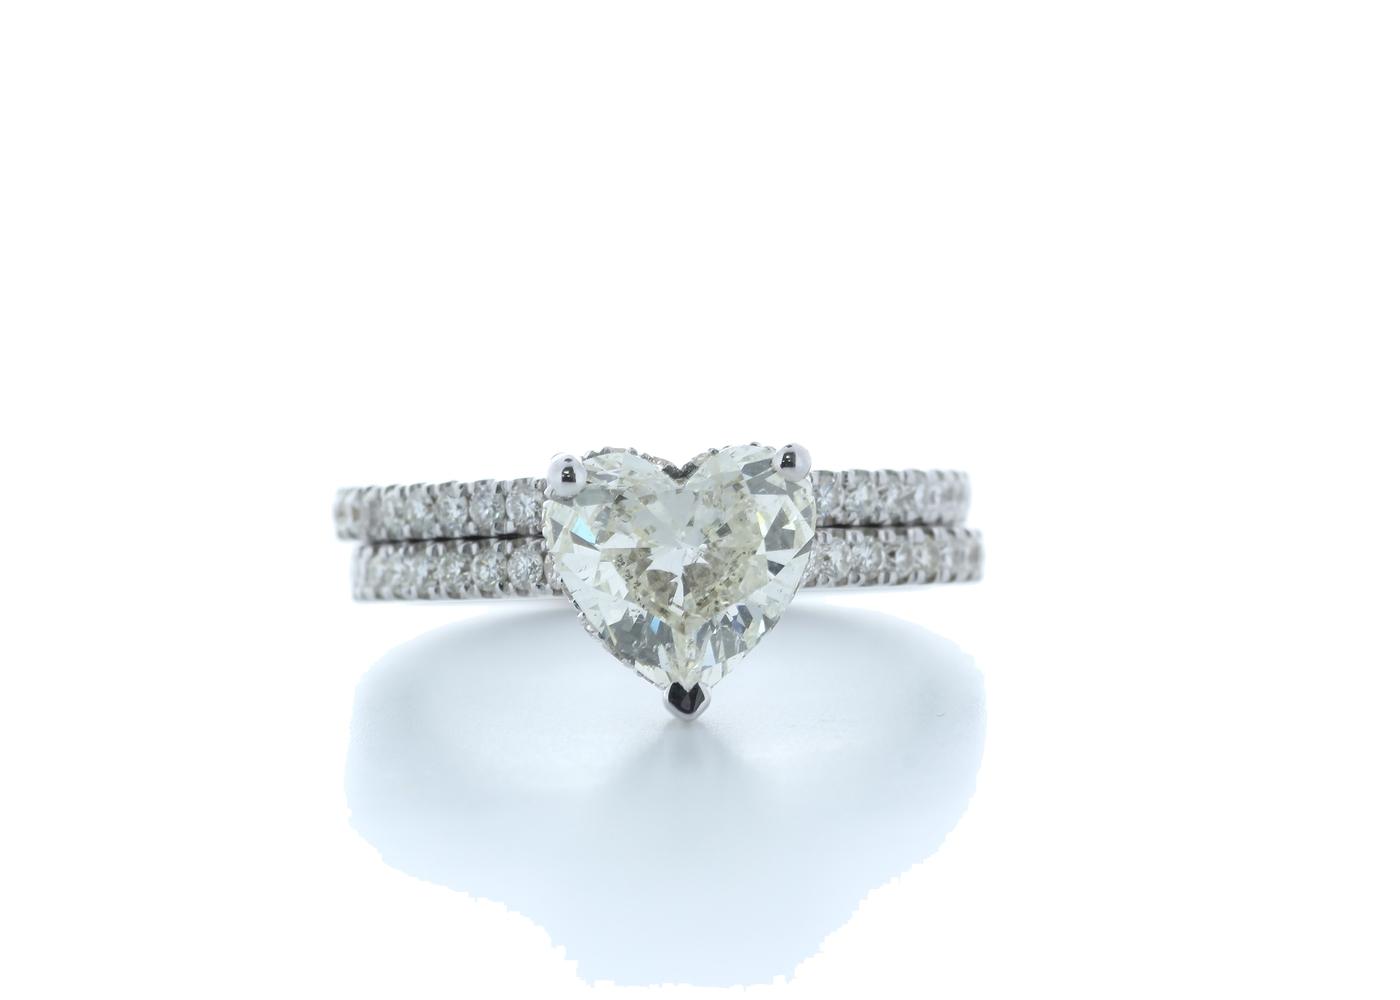 18k White Gold Heart Shape Diamond Ring With Matching Band 2.22 (1.60) Carats